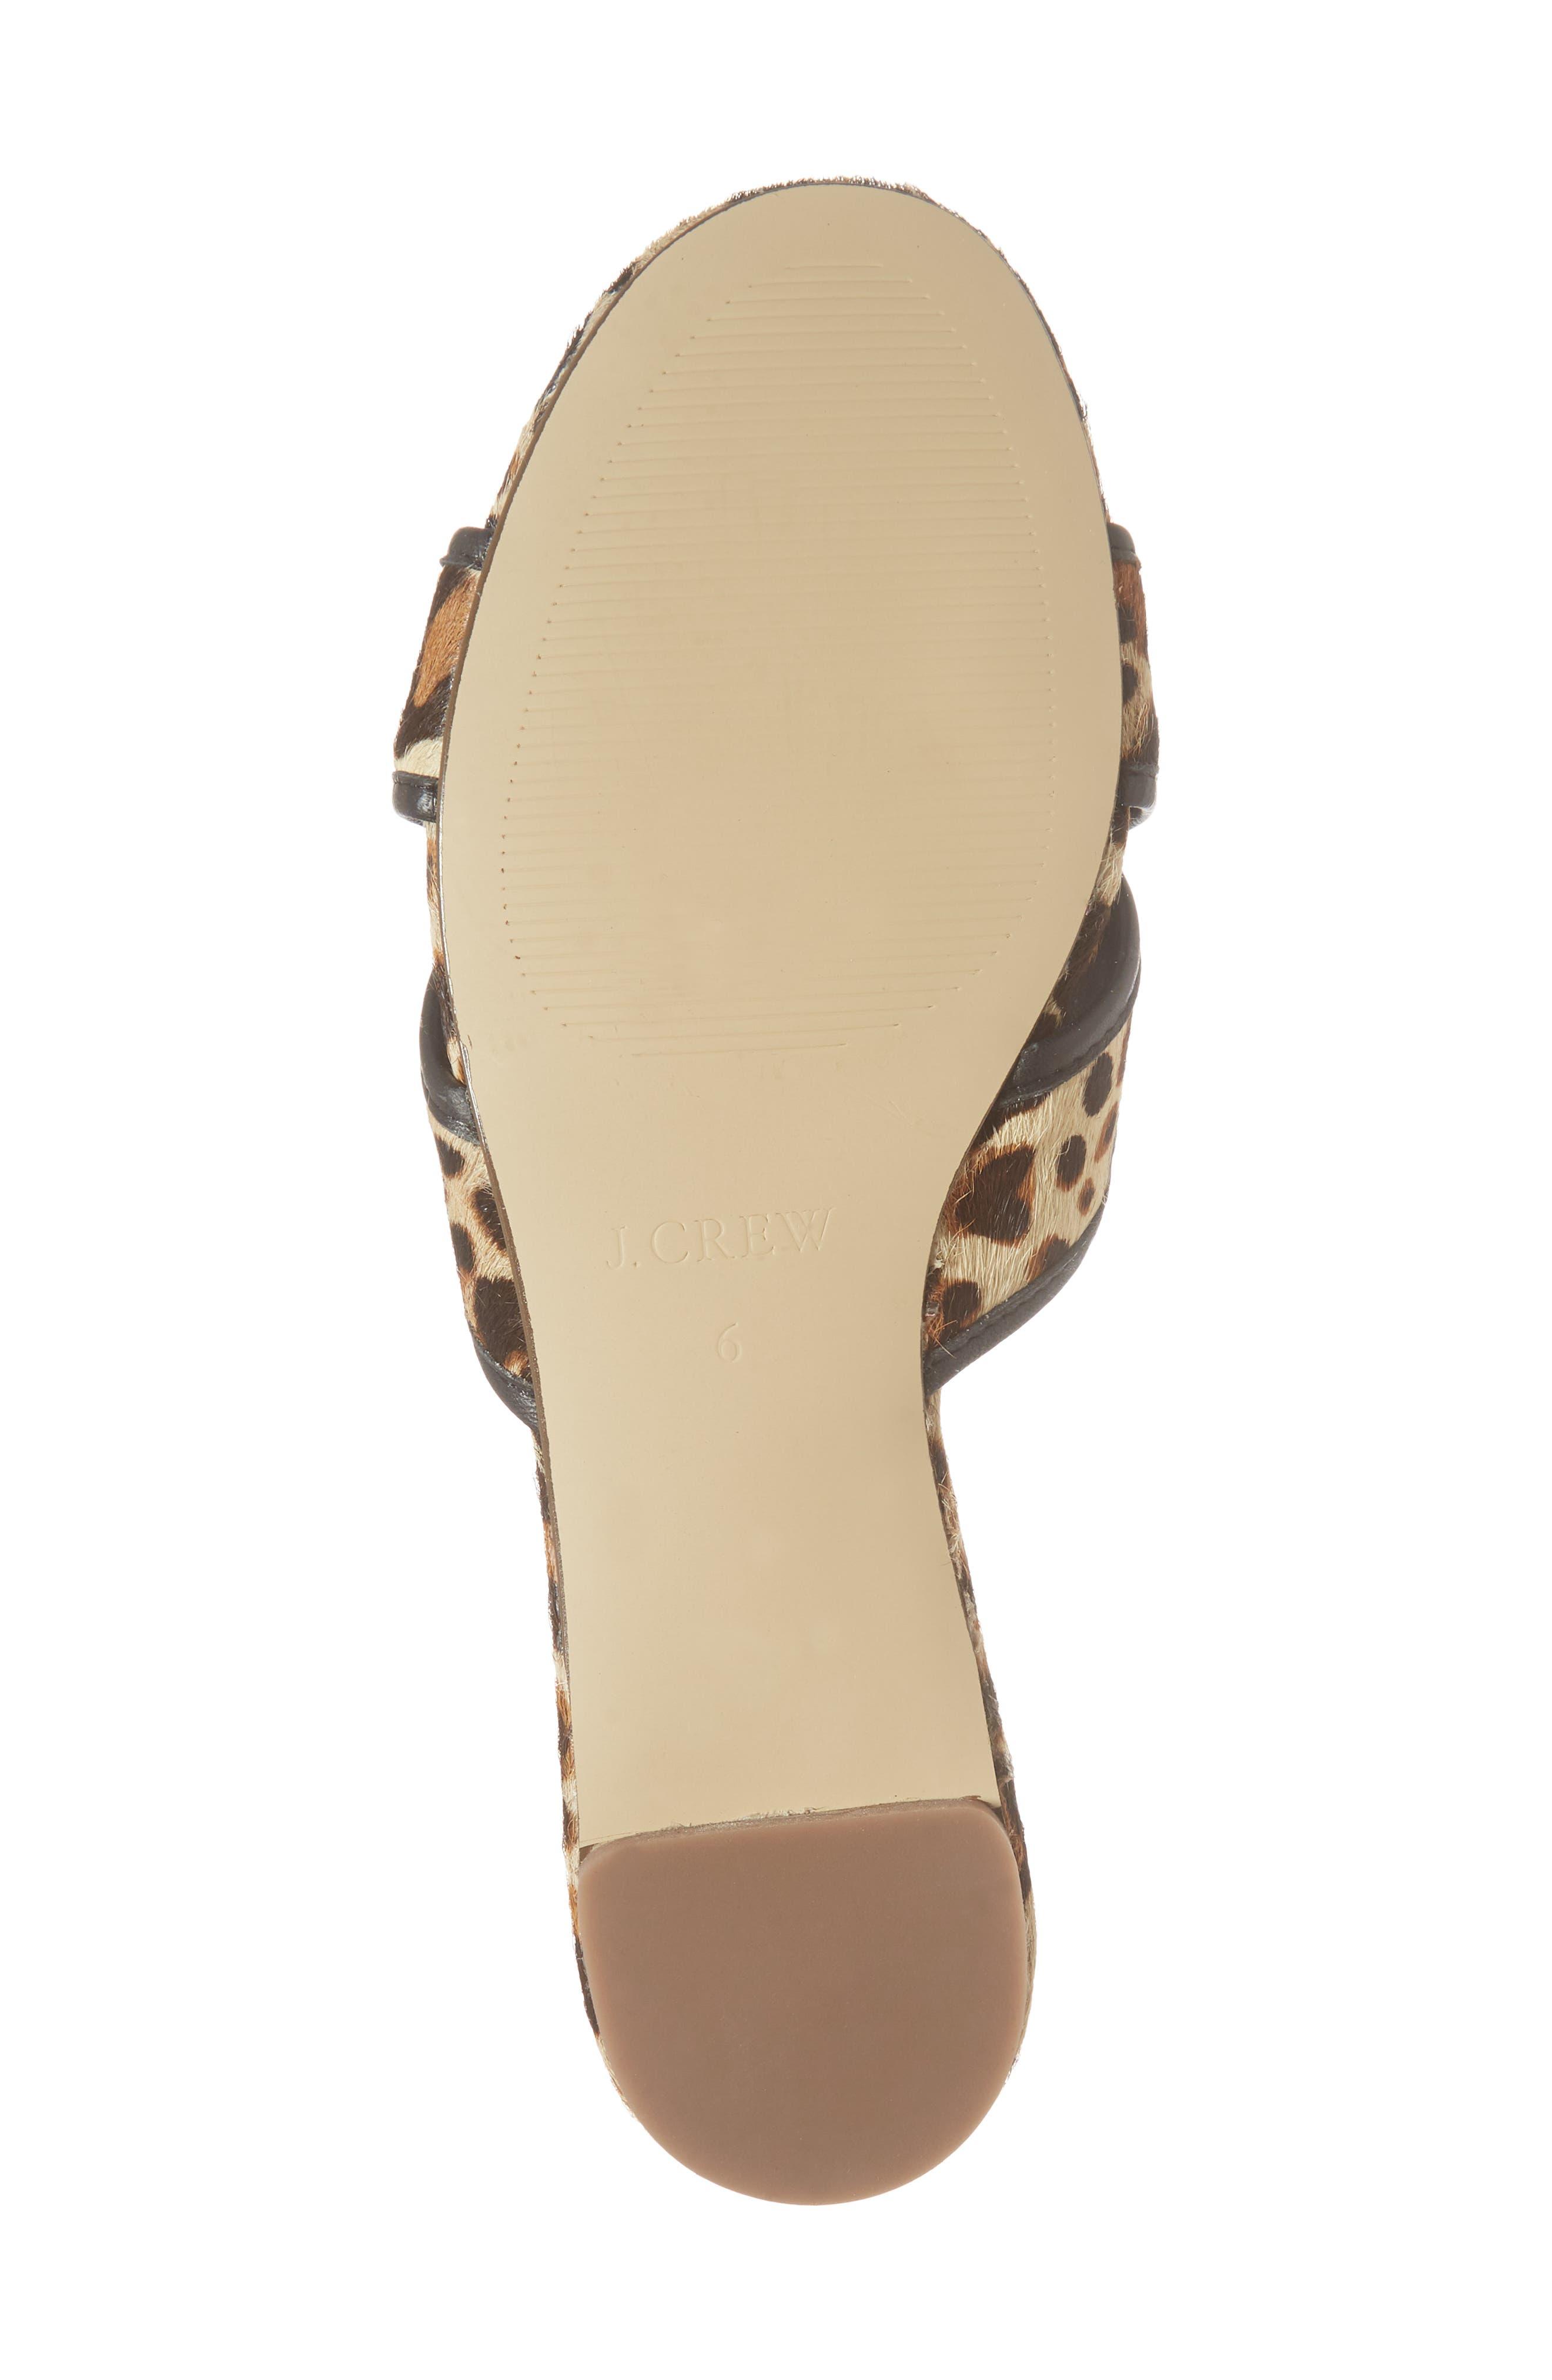 Cora Genuine Calf Hair Slide Sandal,                             Alternate thumbnail 7, color,                             Chocolate Sepia